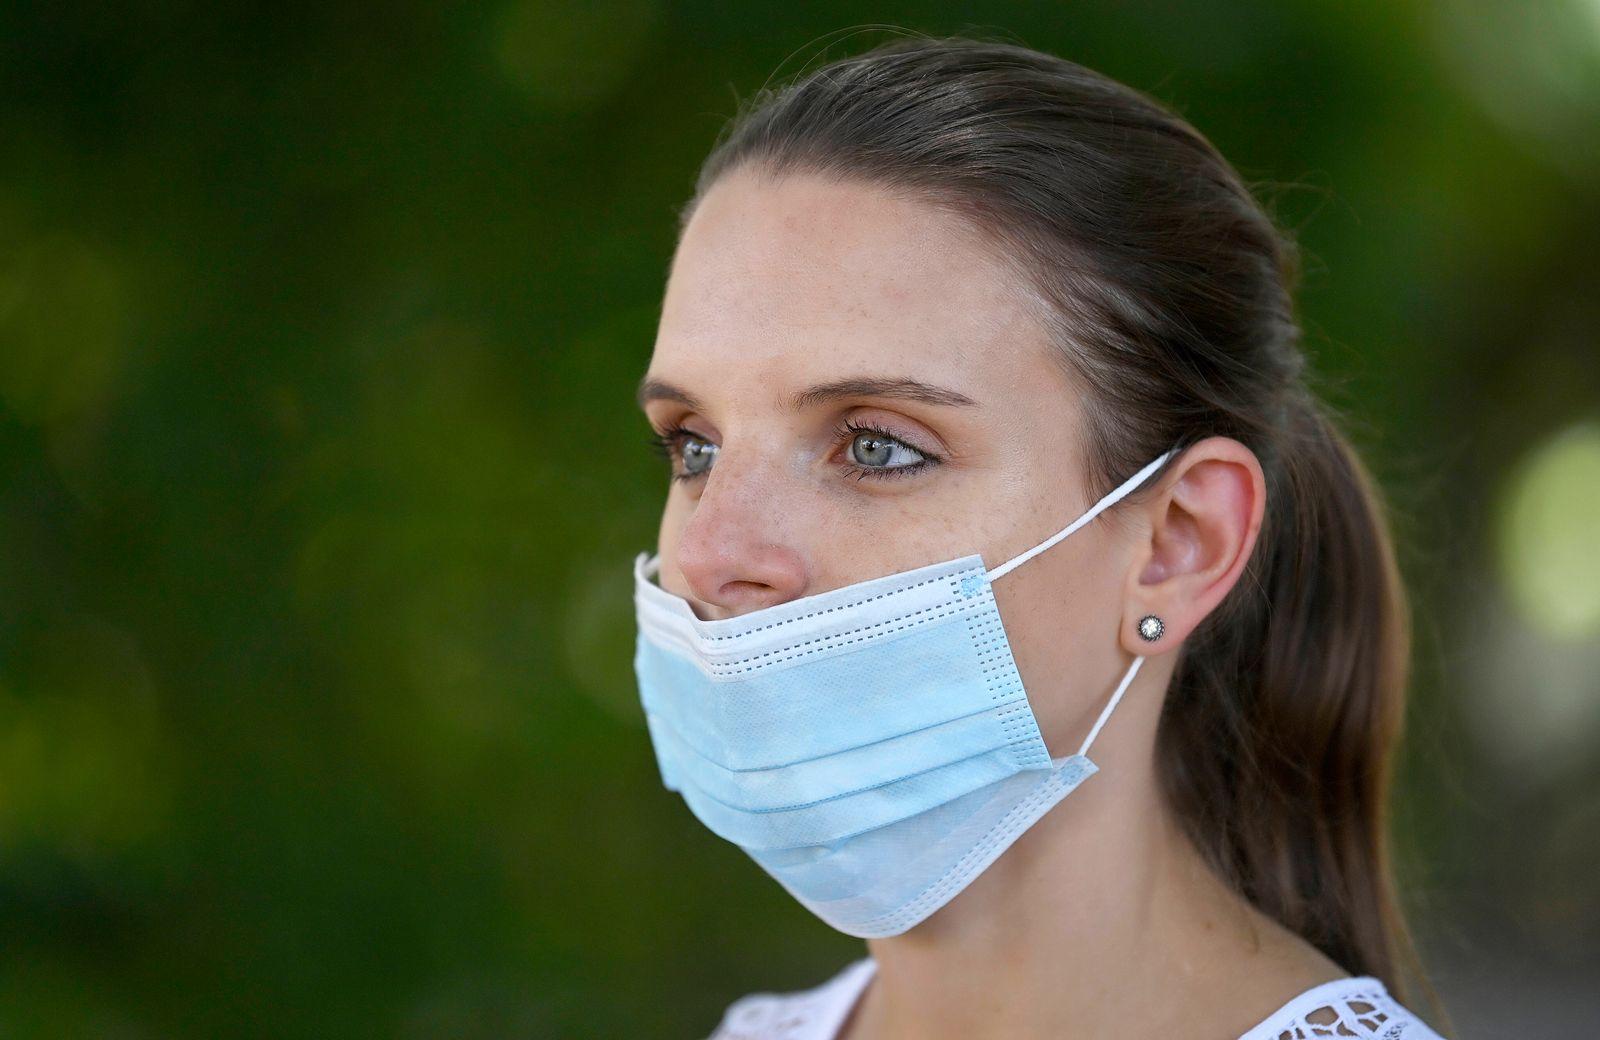 Frau tr?gt Mundschutzmaske unter der Nase, Portrait, Corona-Krise, Deutschland Coronavirus *** Woman wearing a face mask